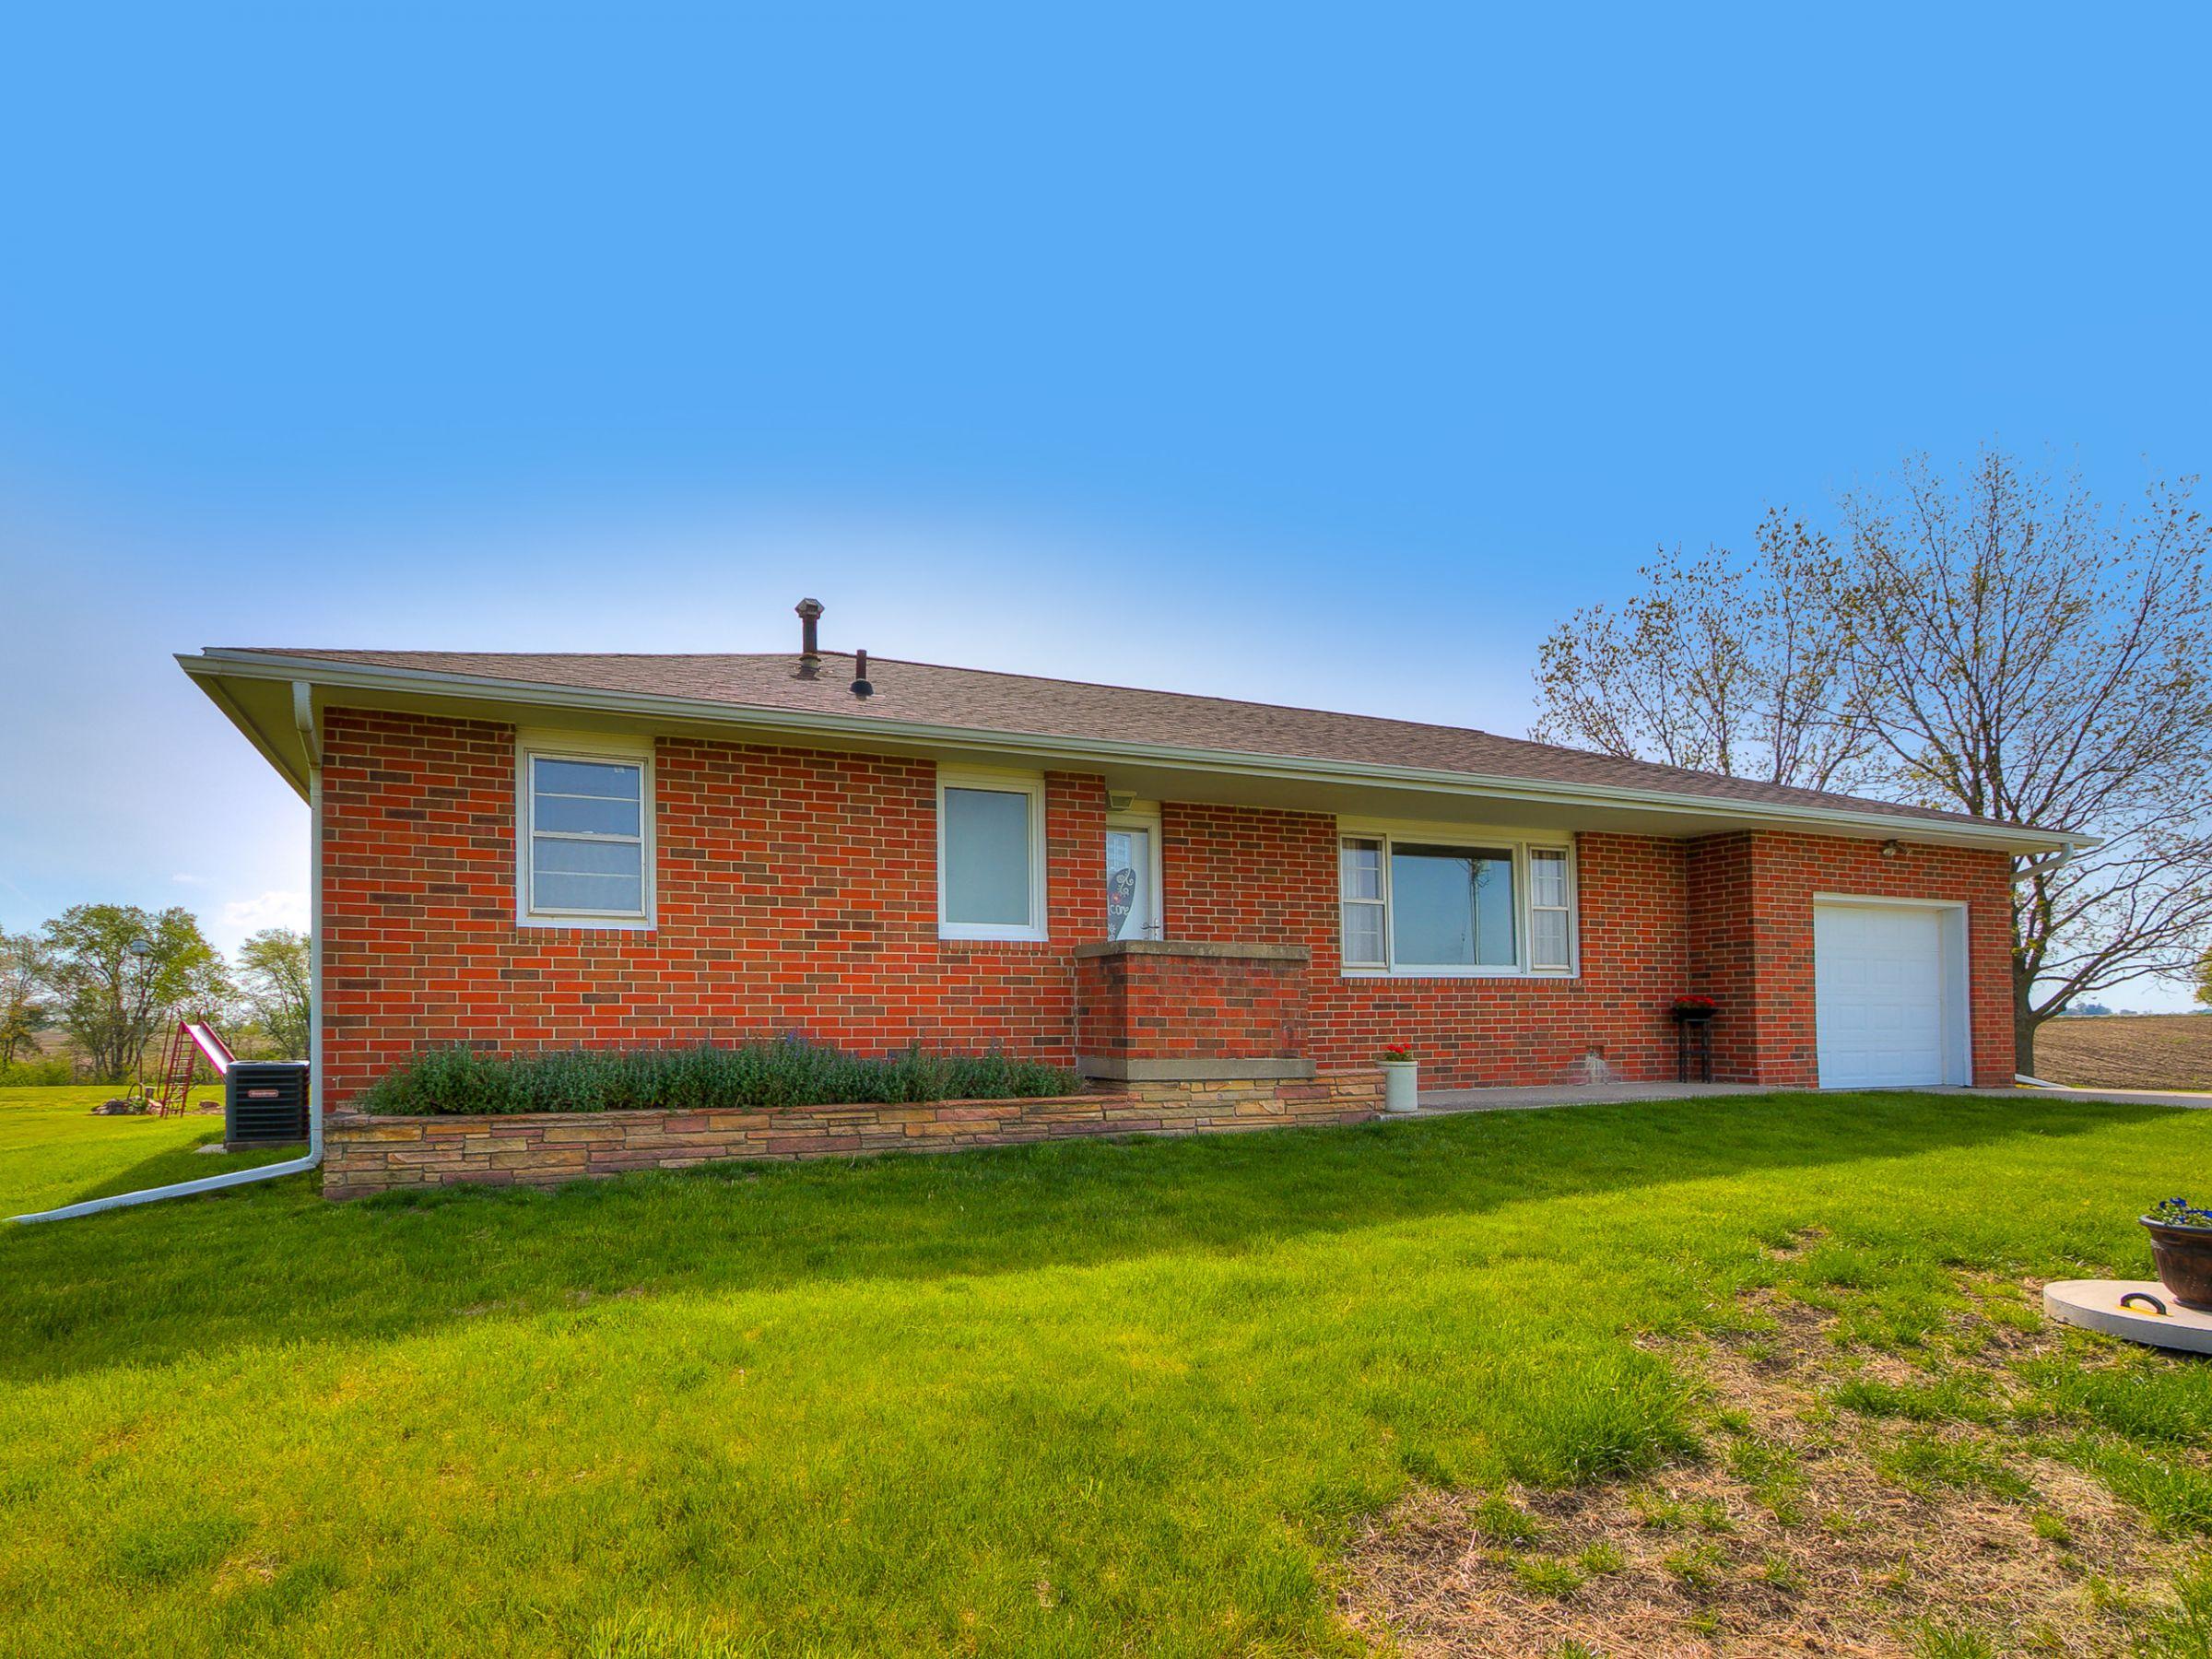 residential-warren-county-iowa-3-acres-listing-number-15516-3-2021-05-12-144634.jpg